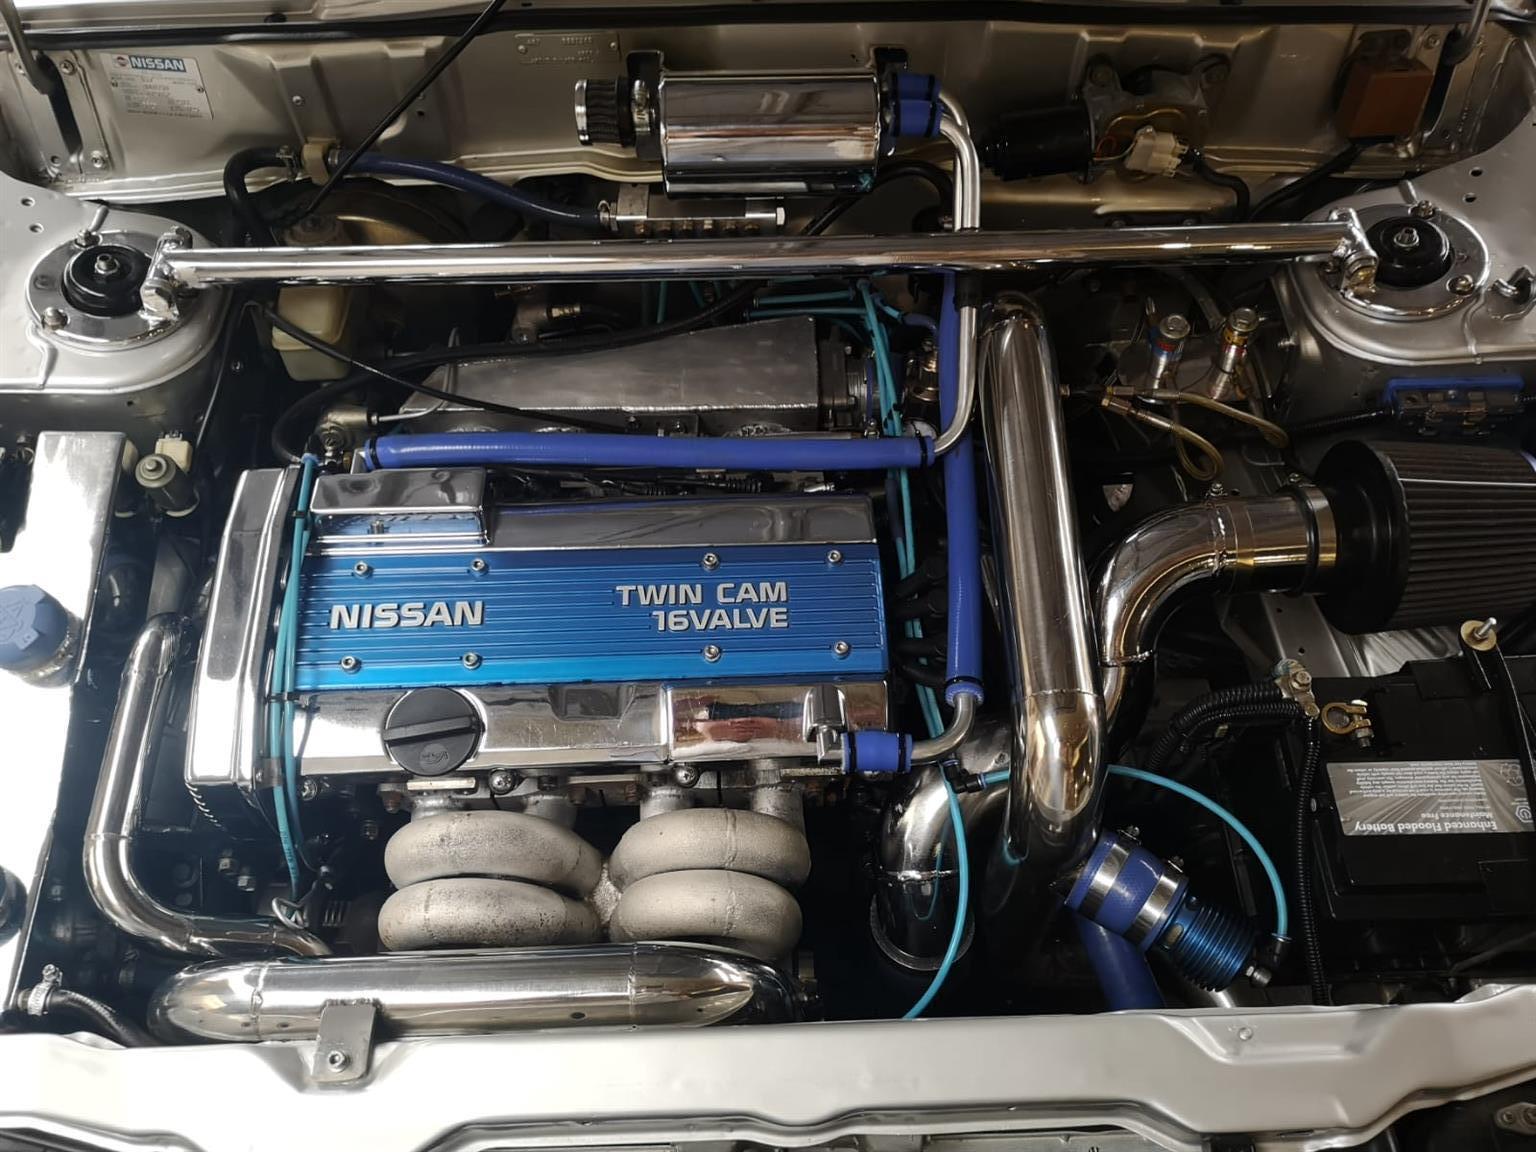 1991 Nissan Sentra Coupe CA 1.8 Turbo